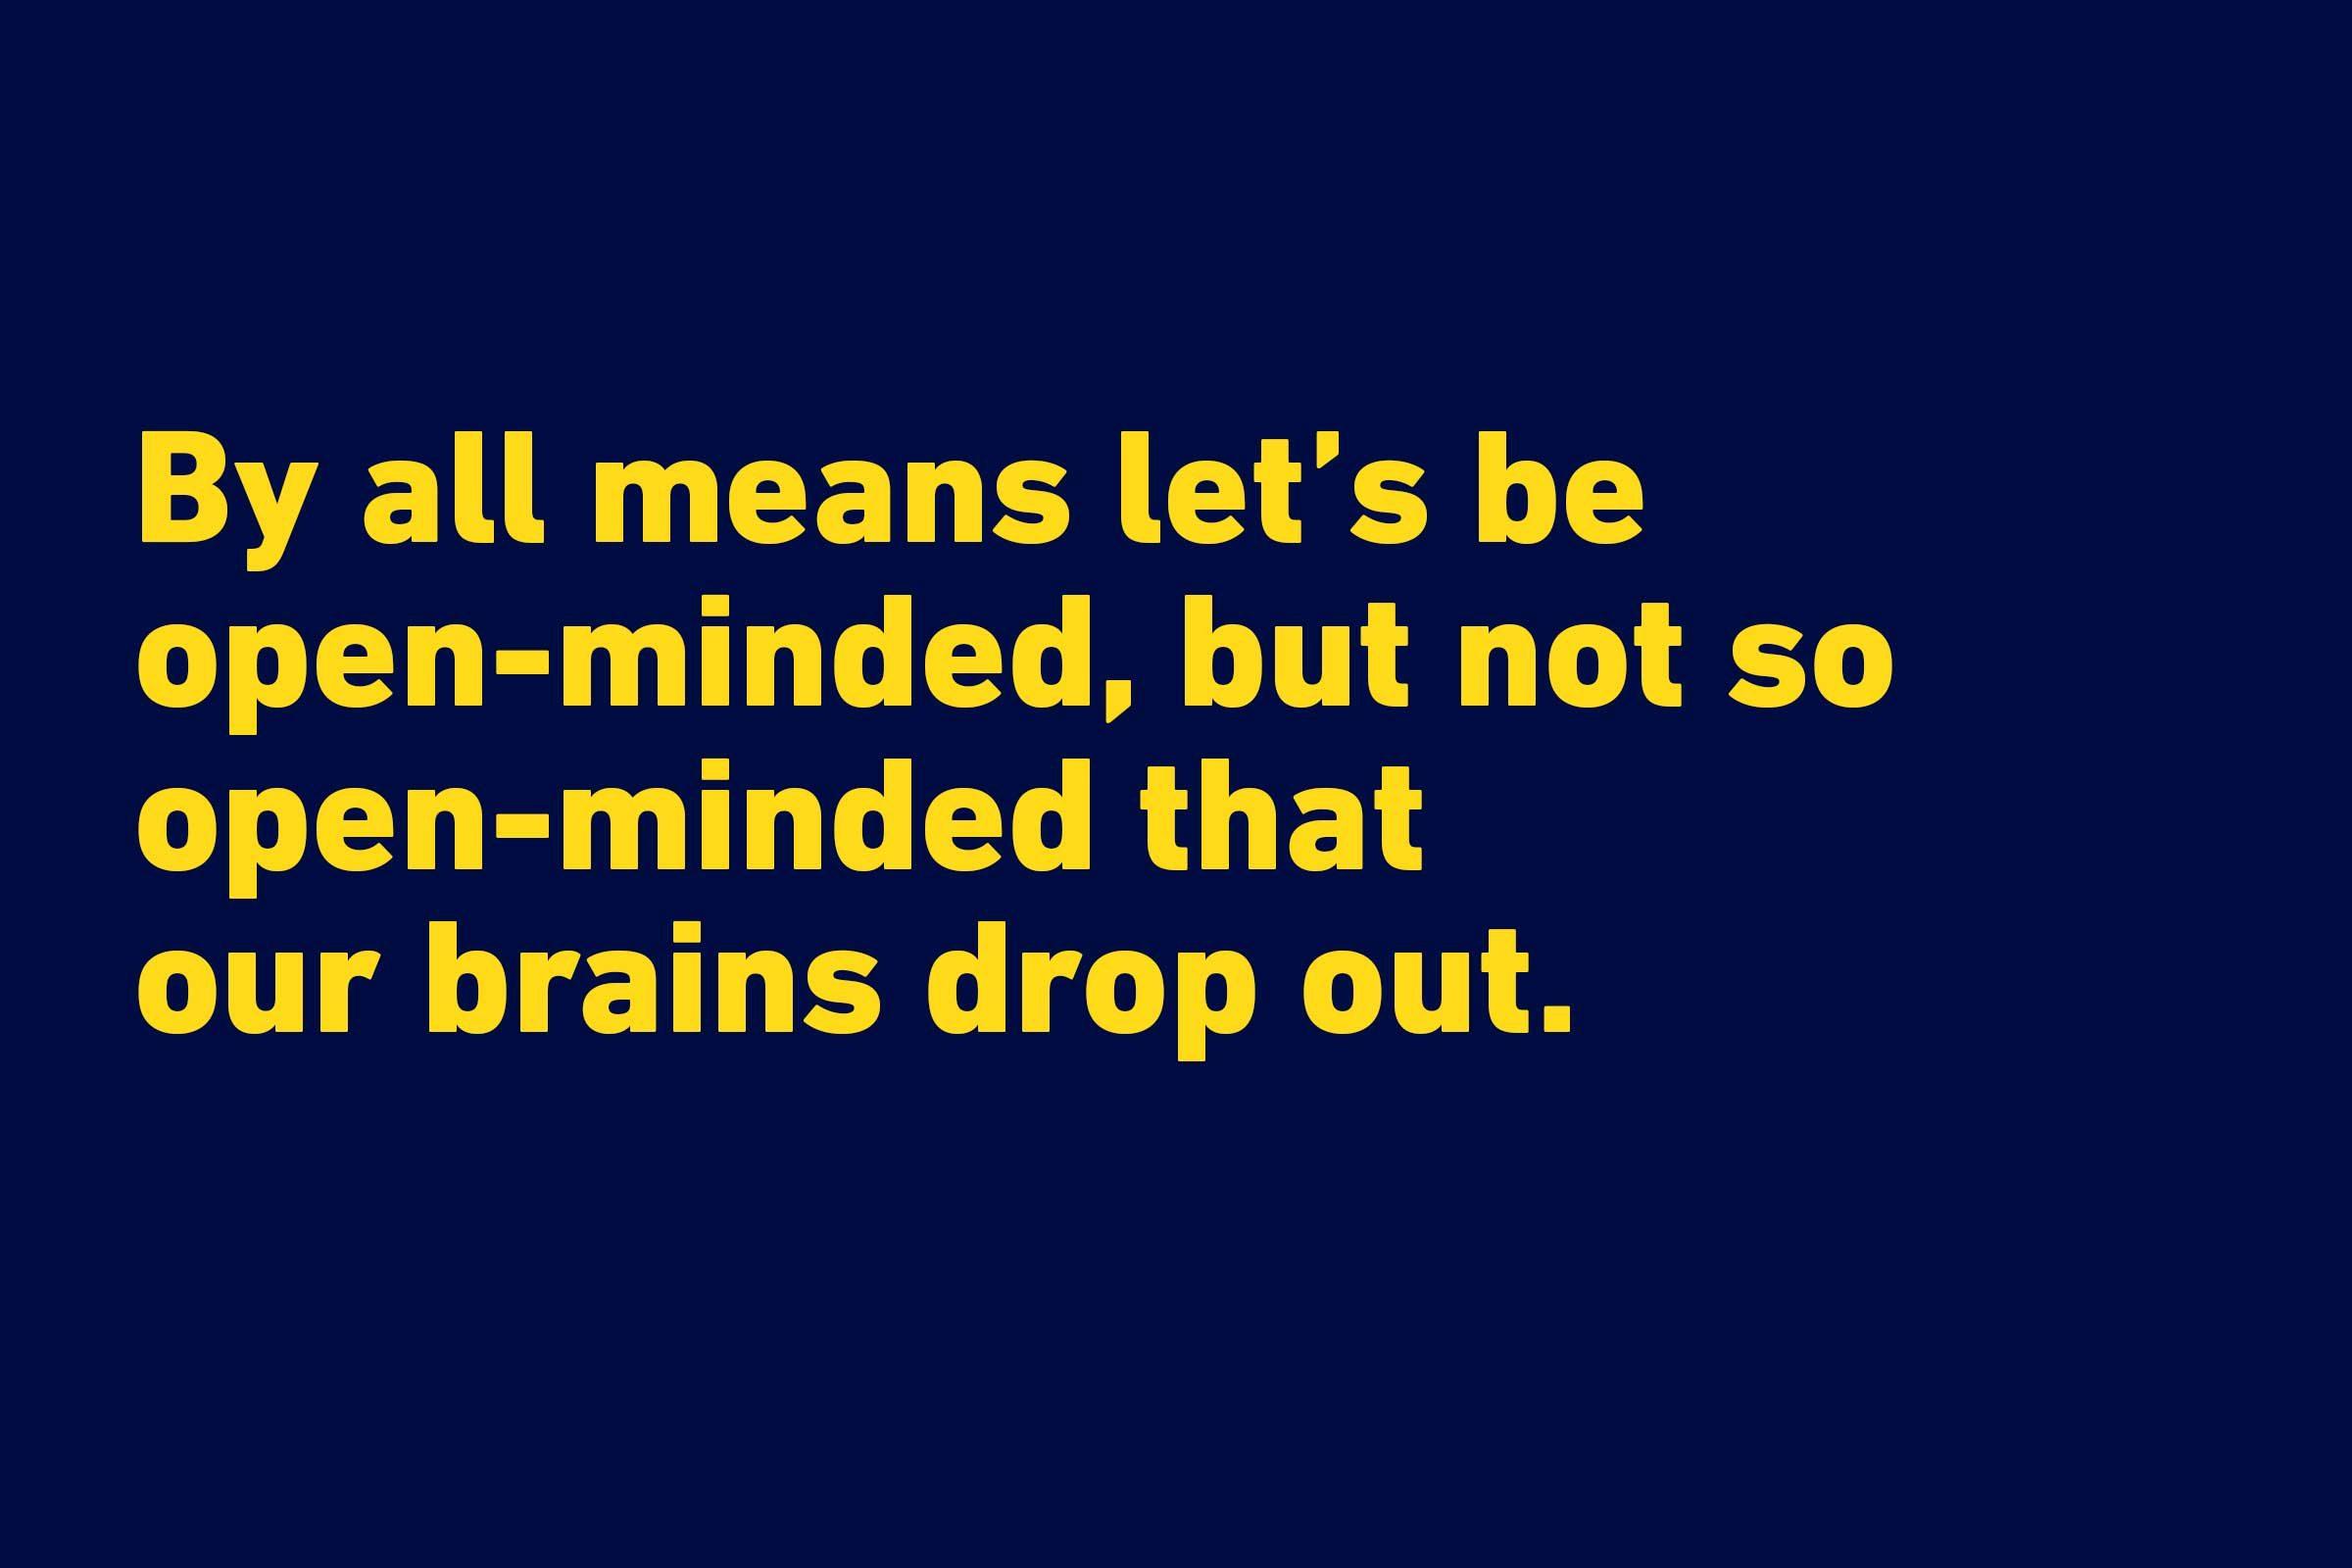 Richard Dawkins funny quote